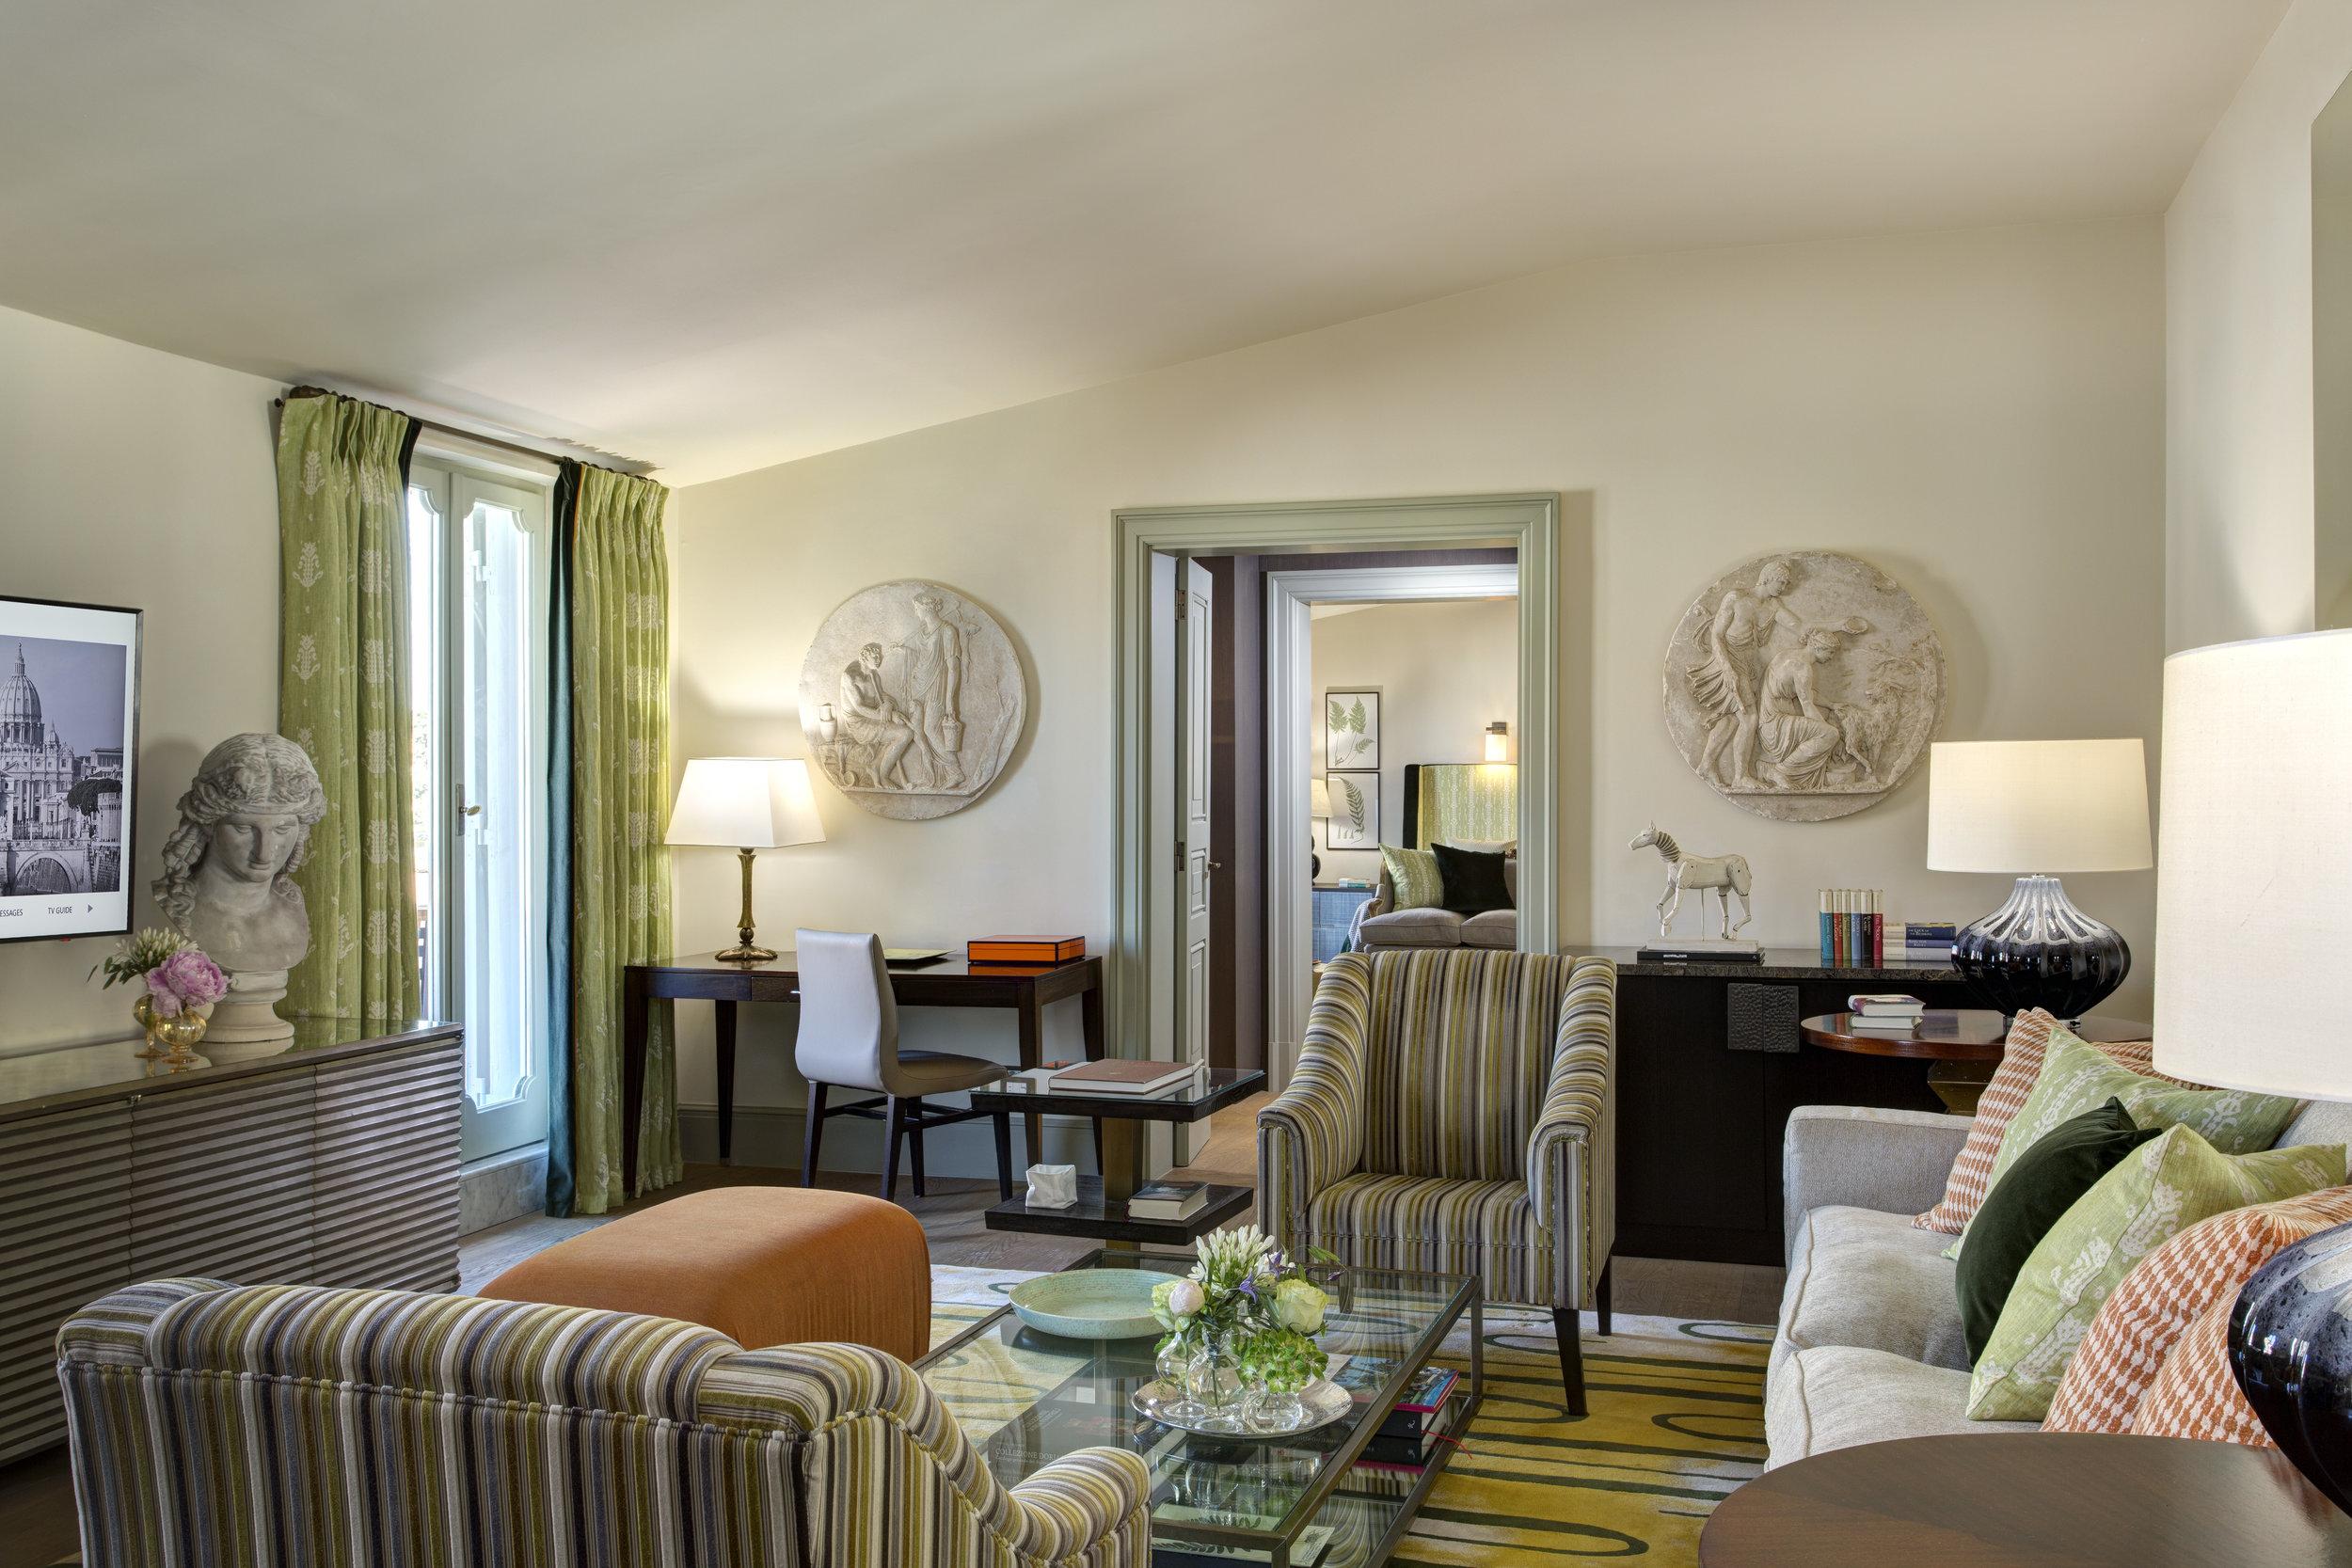 6 RFH Hotel de Russie - Popolo Suite 0258 May 17.JPG